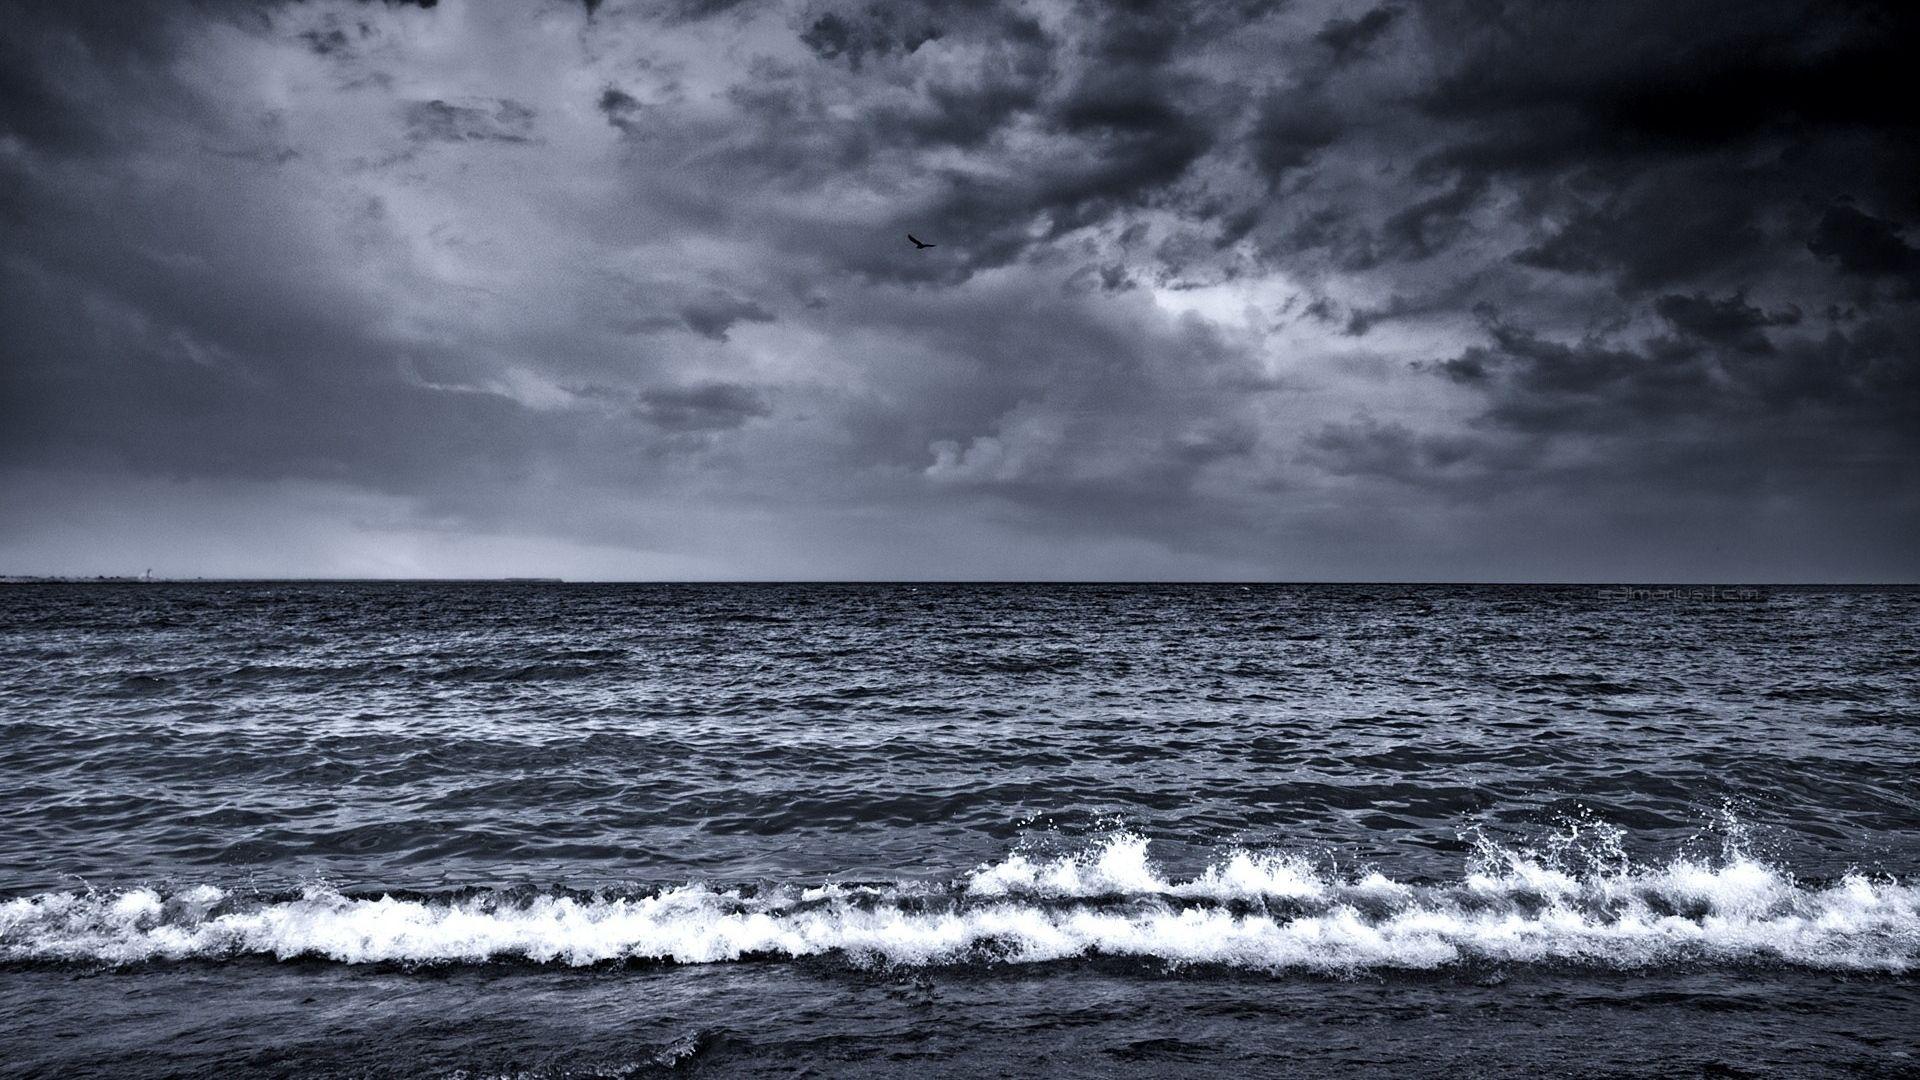 1920x1080 Wallpaper Sea Waves Surf Foam Black And White